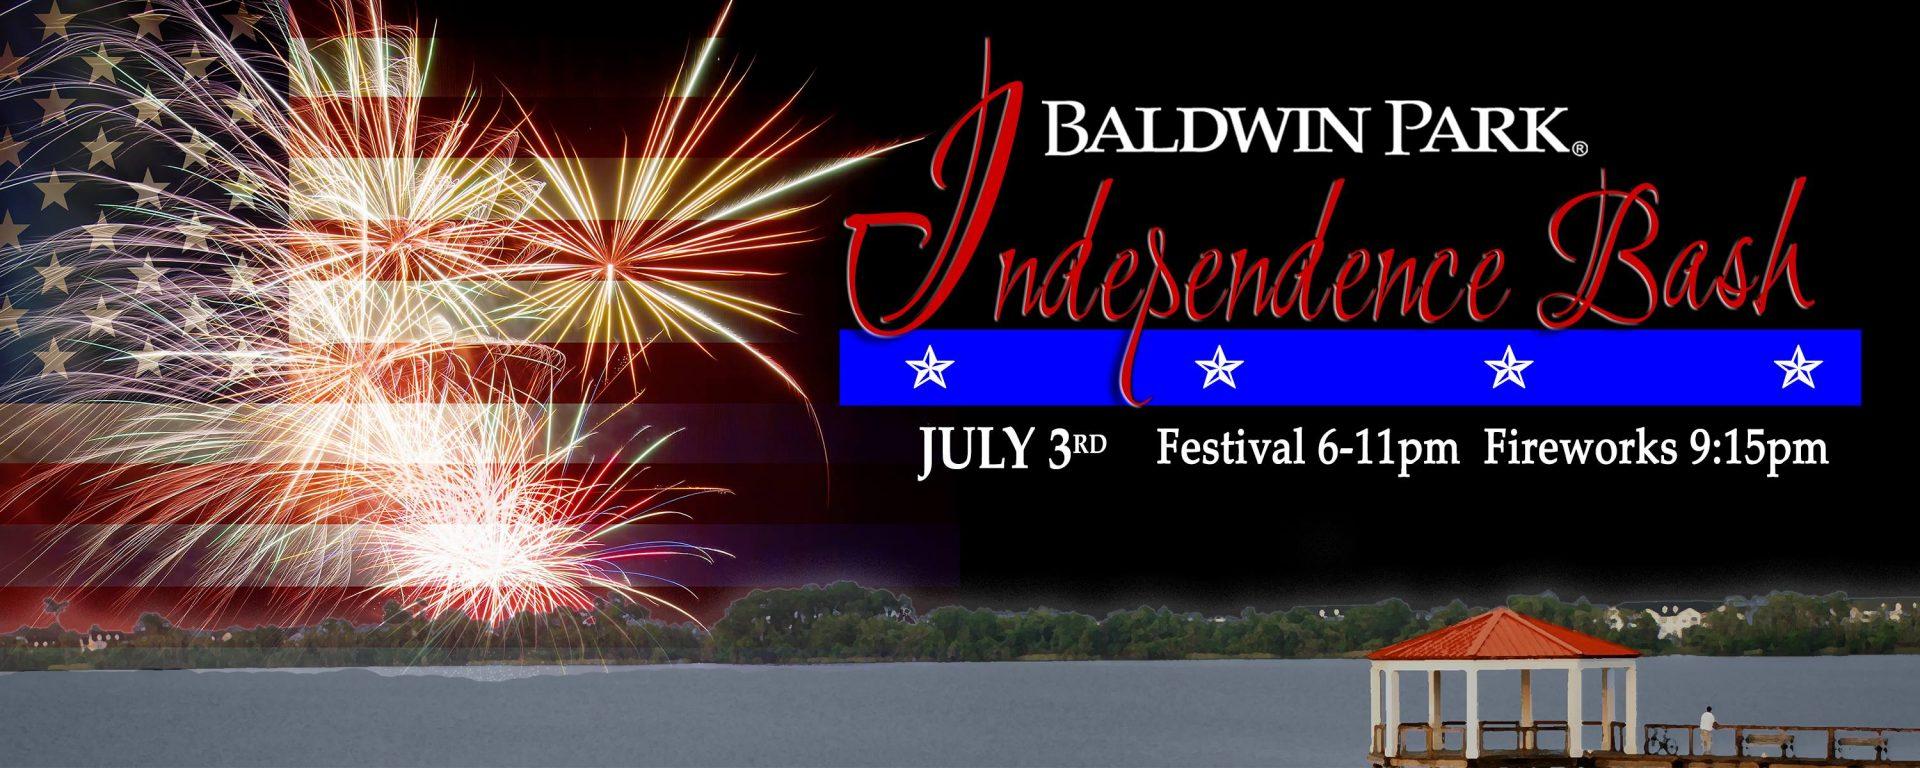 Baldwin Park 4th of July celebration